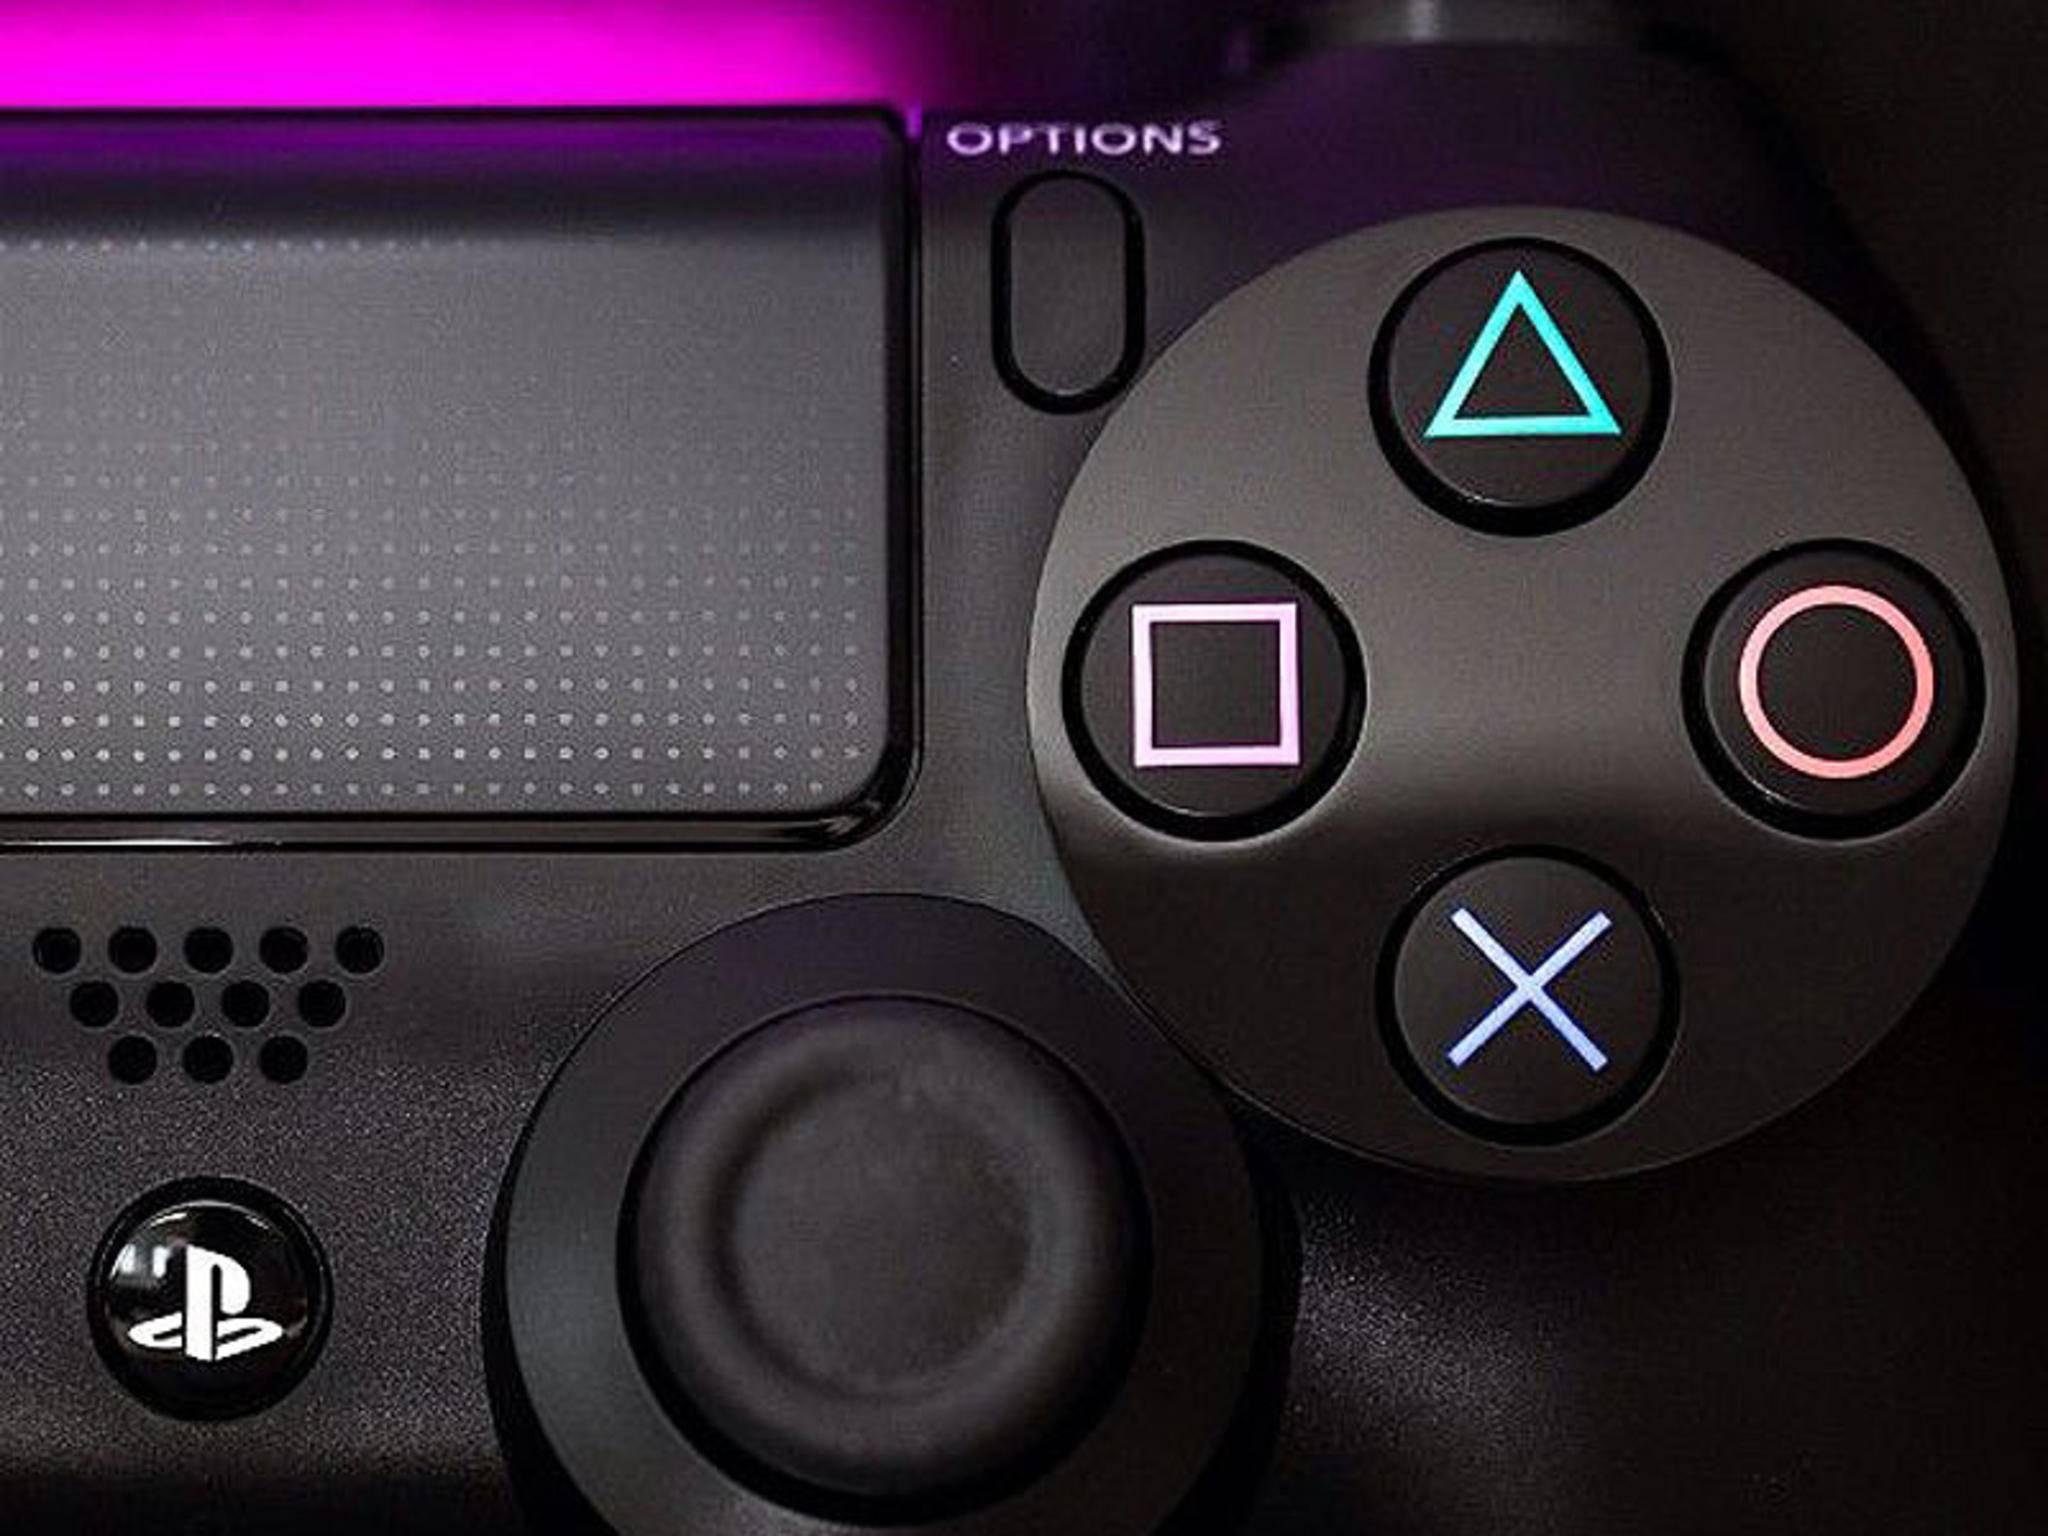 Wann kommt die PS4 Neo in die Geschäfte?